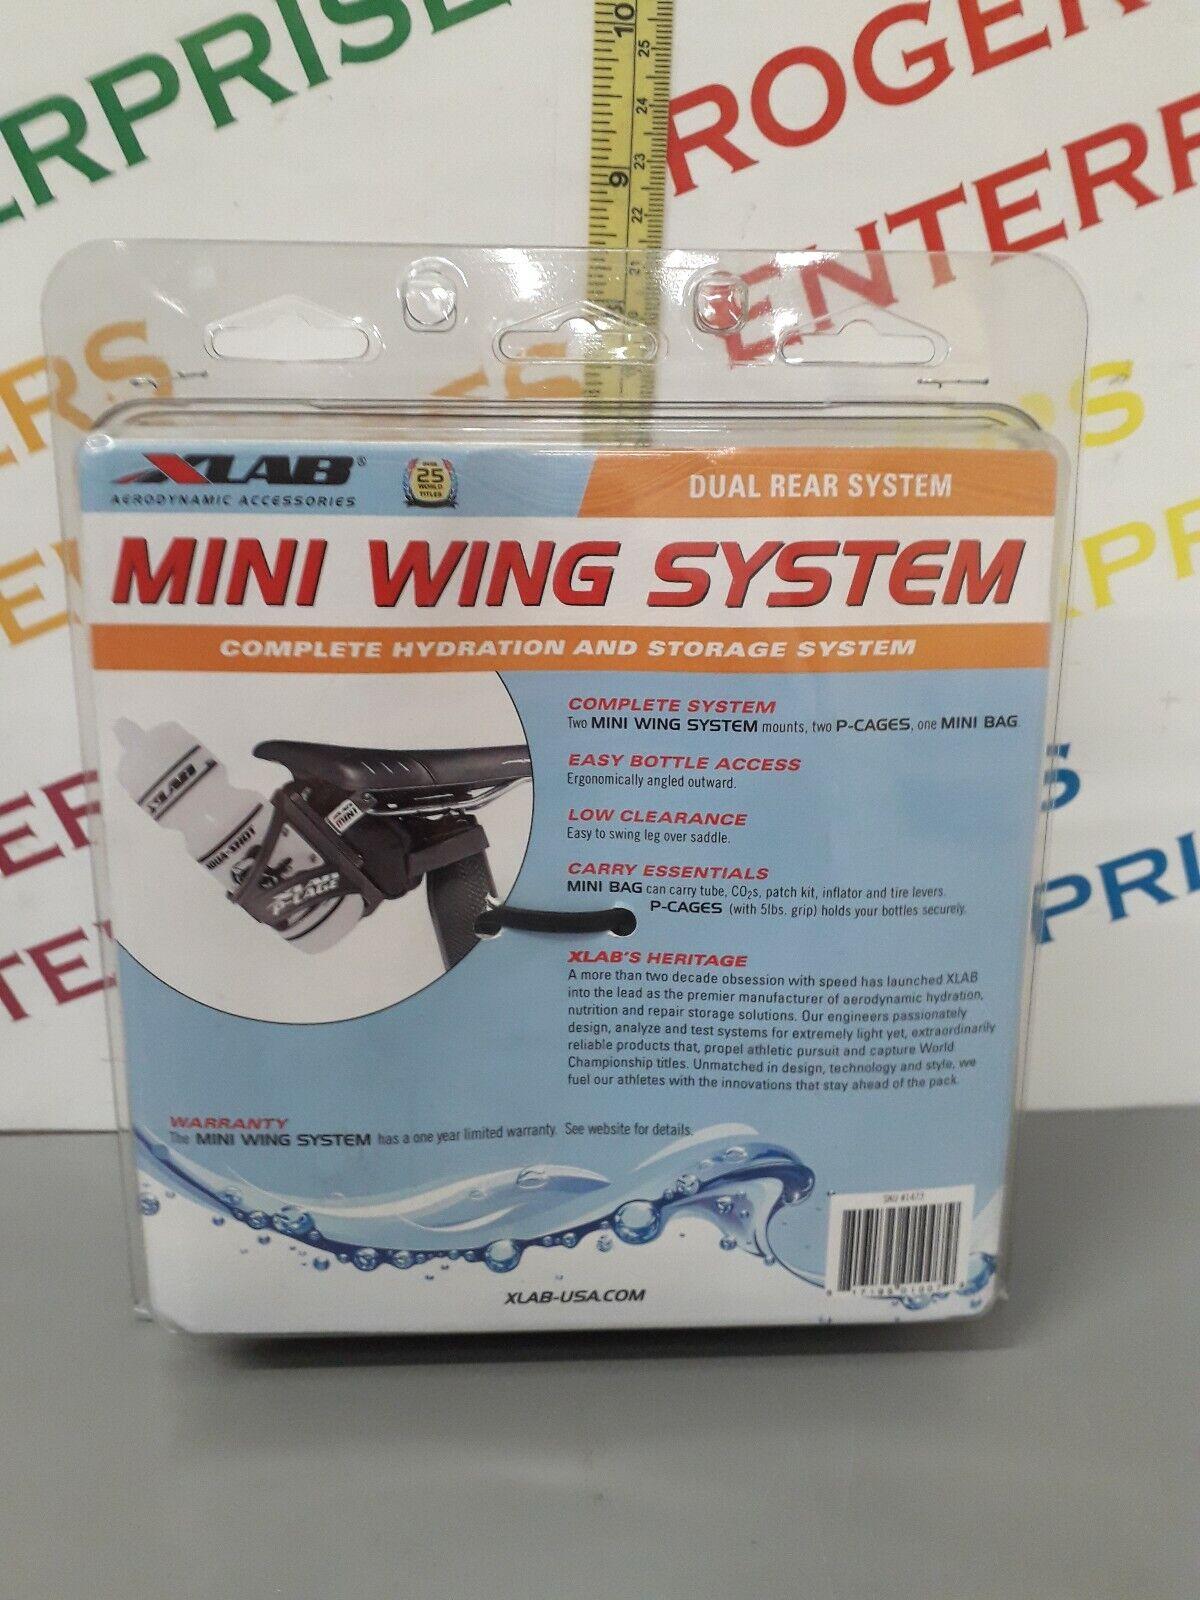 XLAB Mini Wing Kit Hydration & Storage System 2 Bottle P-Cages & mini bag - NEW